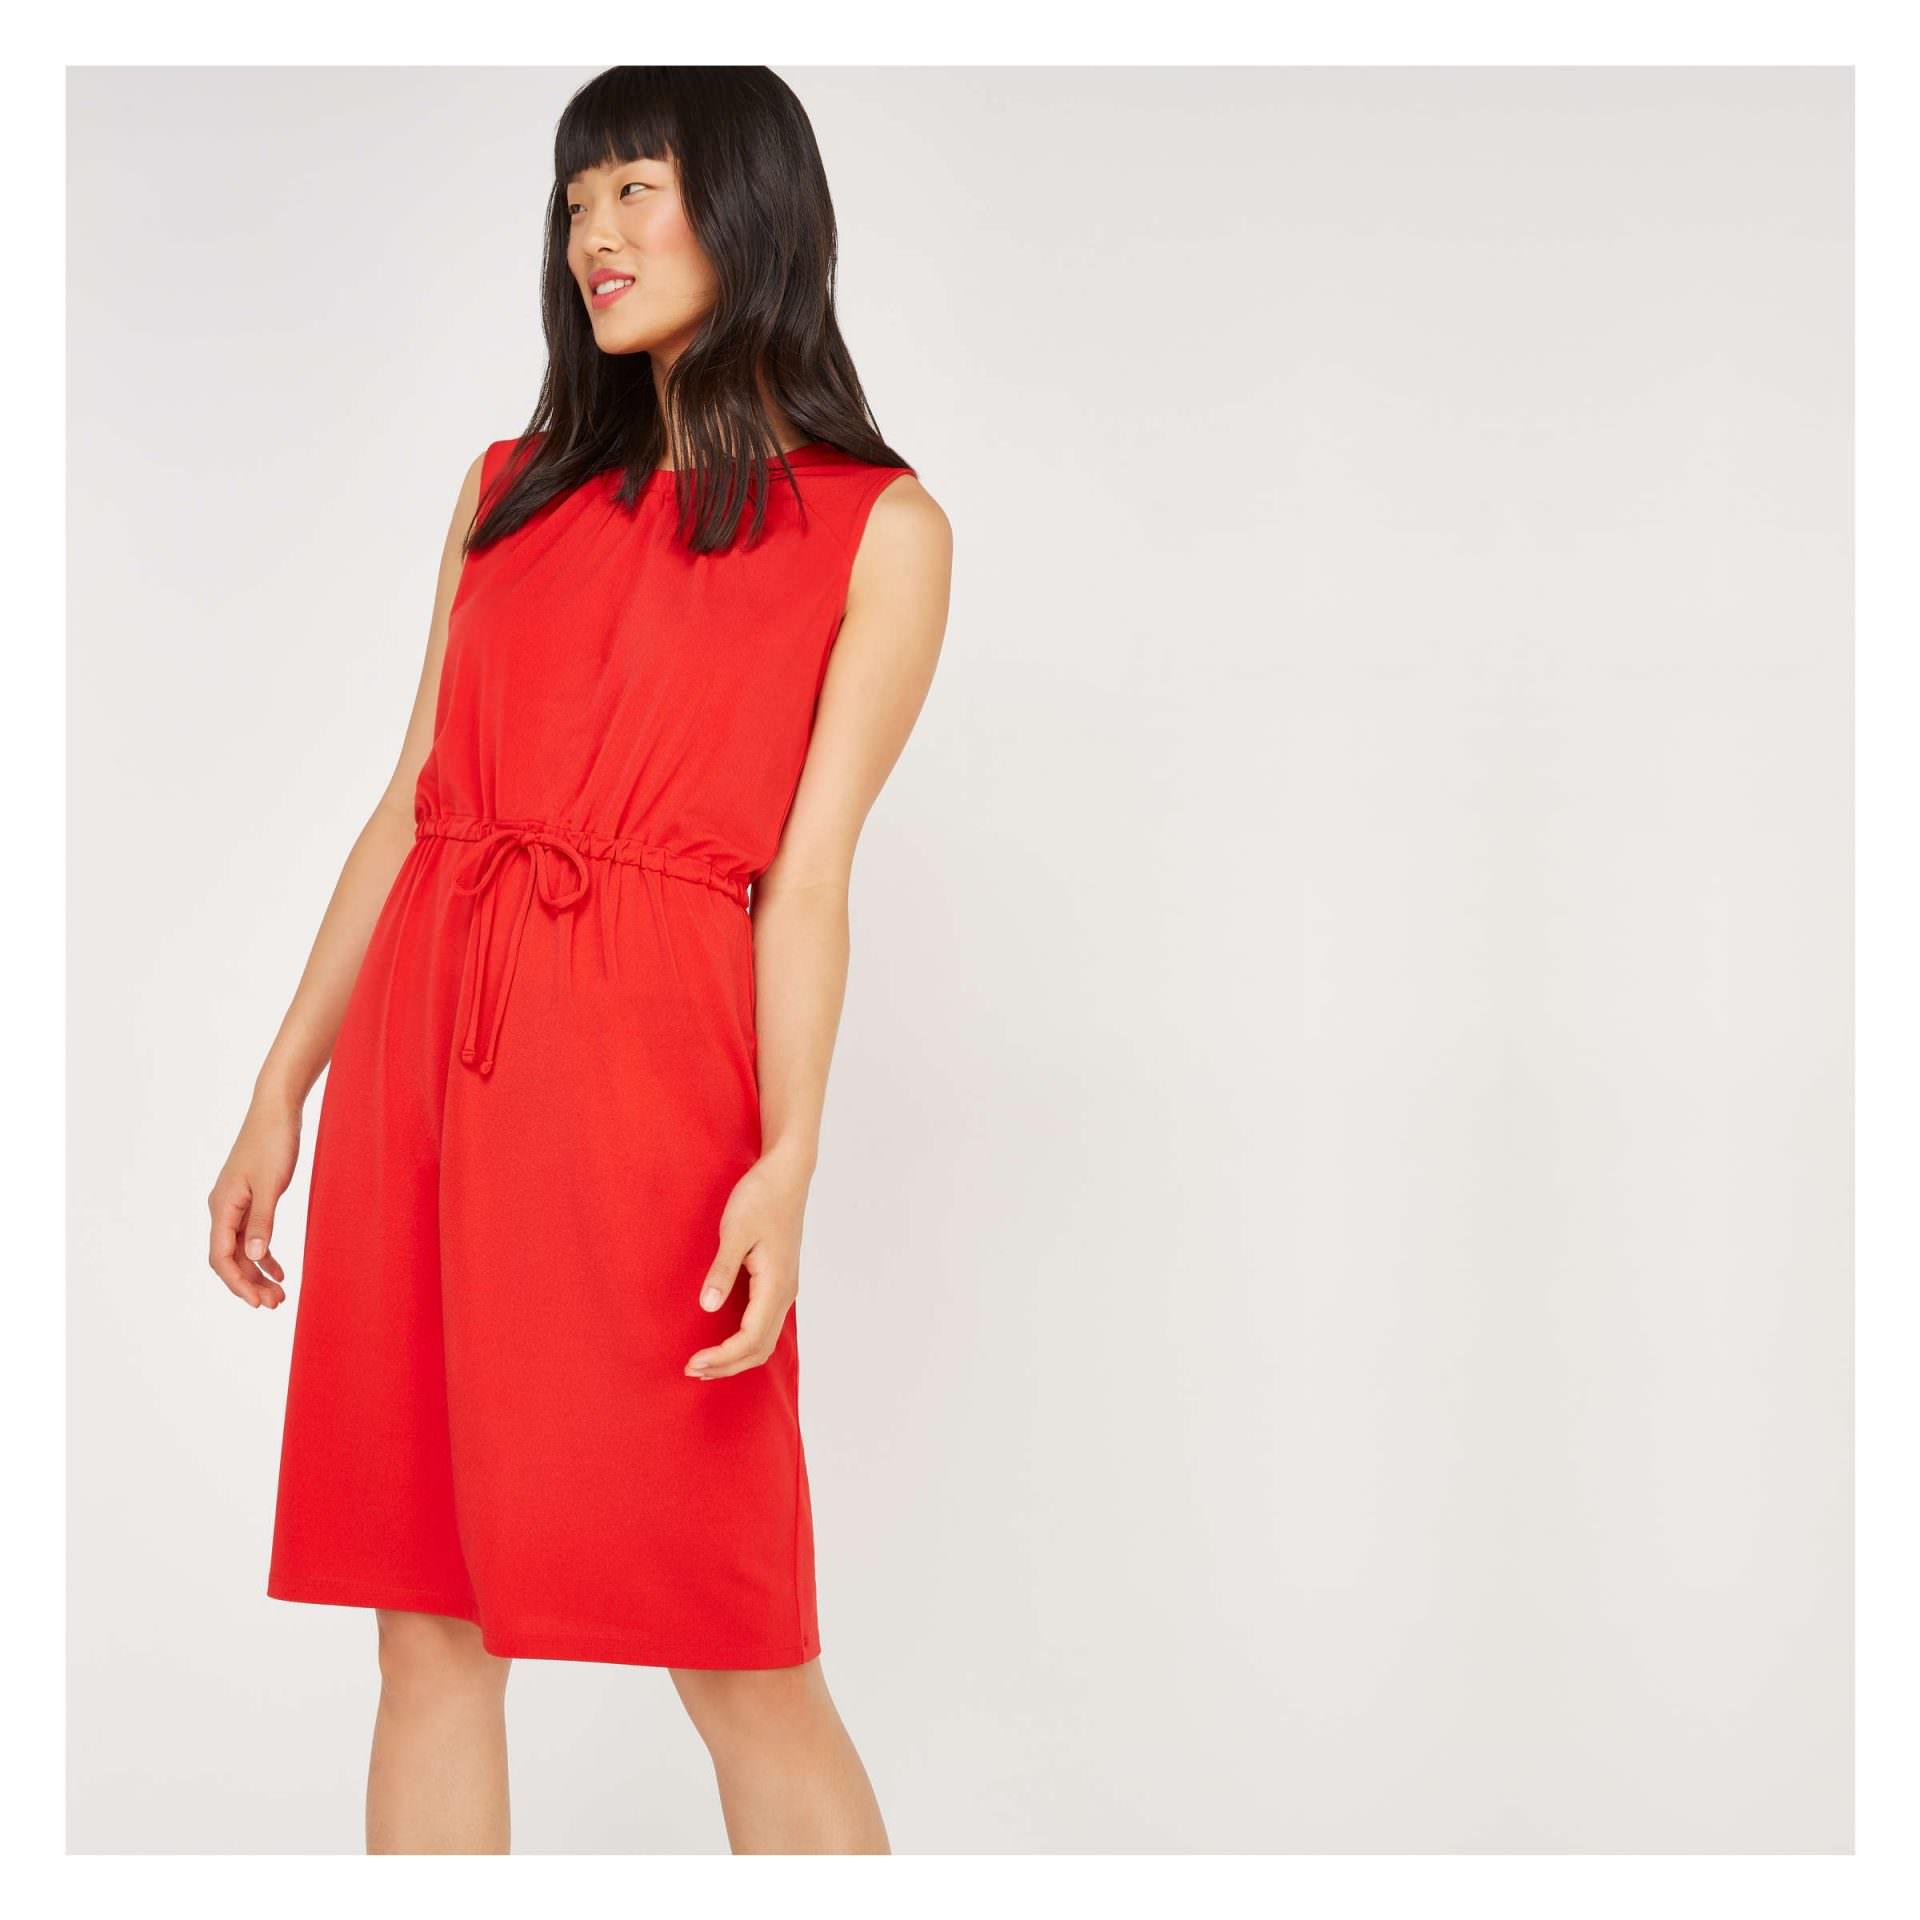 448b0ef6383 Αυτό το φόρεμα που δένει στη μέση είναι ιδανικό αν έχεις καμπύλες και  περιφέρεια! Μπορείς να το συνδυάσεις με ankle boots που είναι και στη μόδα.